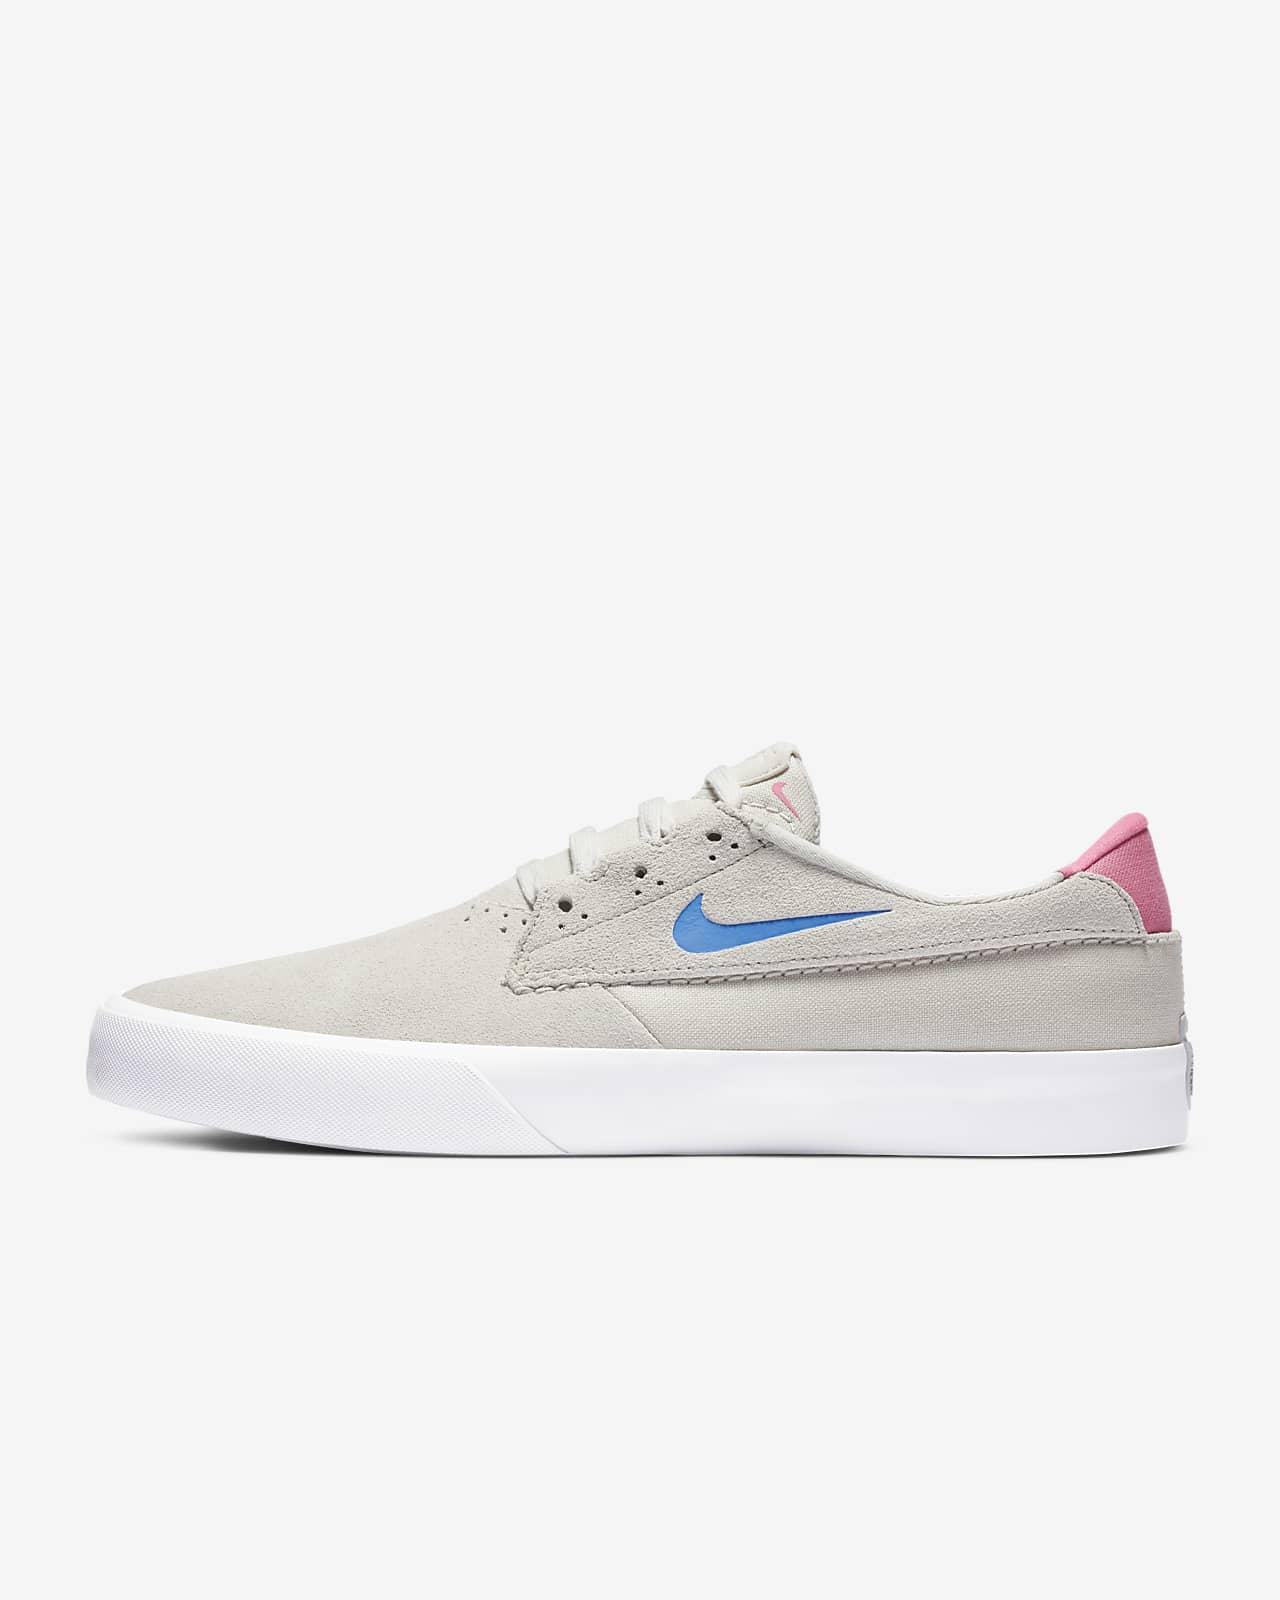 Chaussure de skateboard Nike SB Shane T